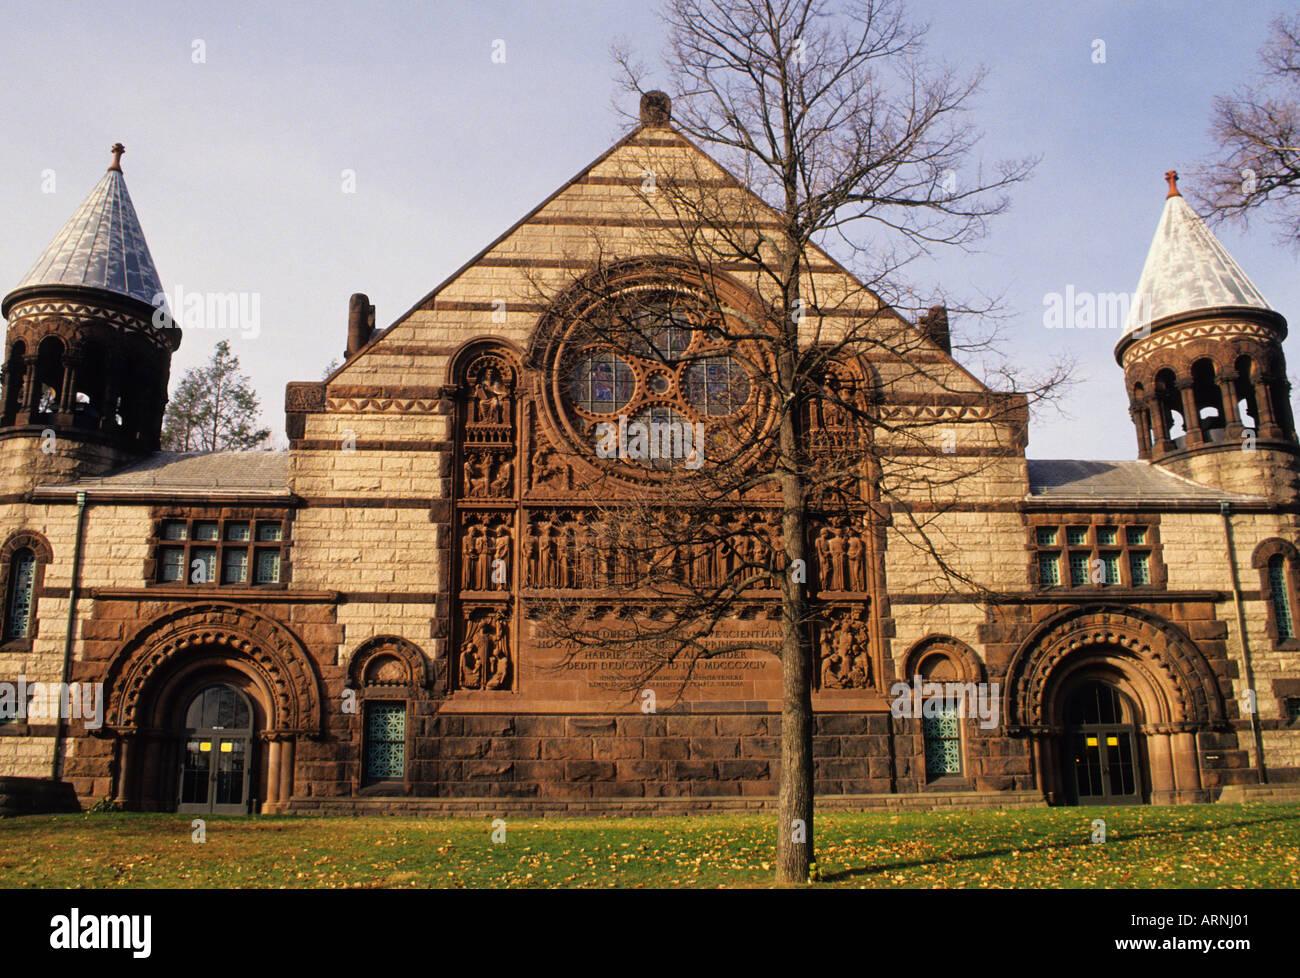 2019 year looks- Campus: on Looks Amber Princeton University